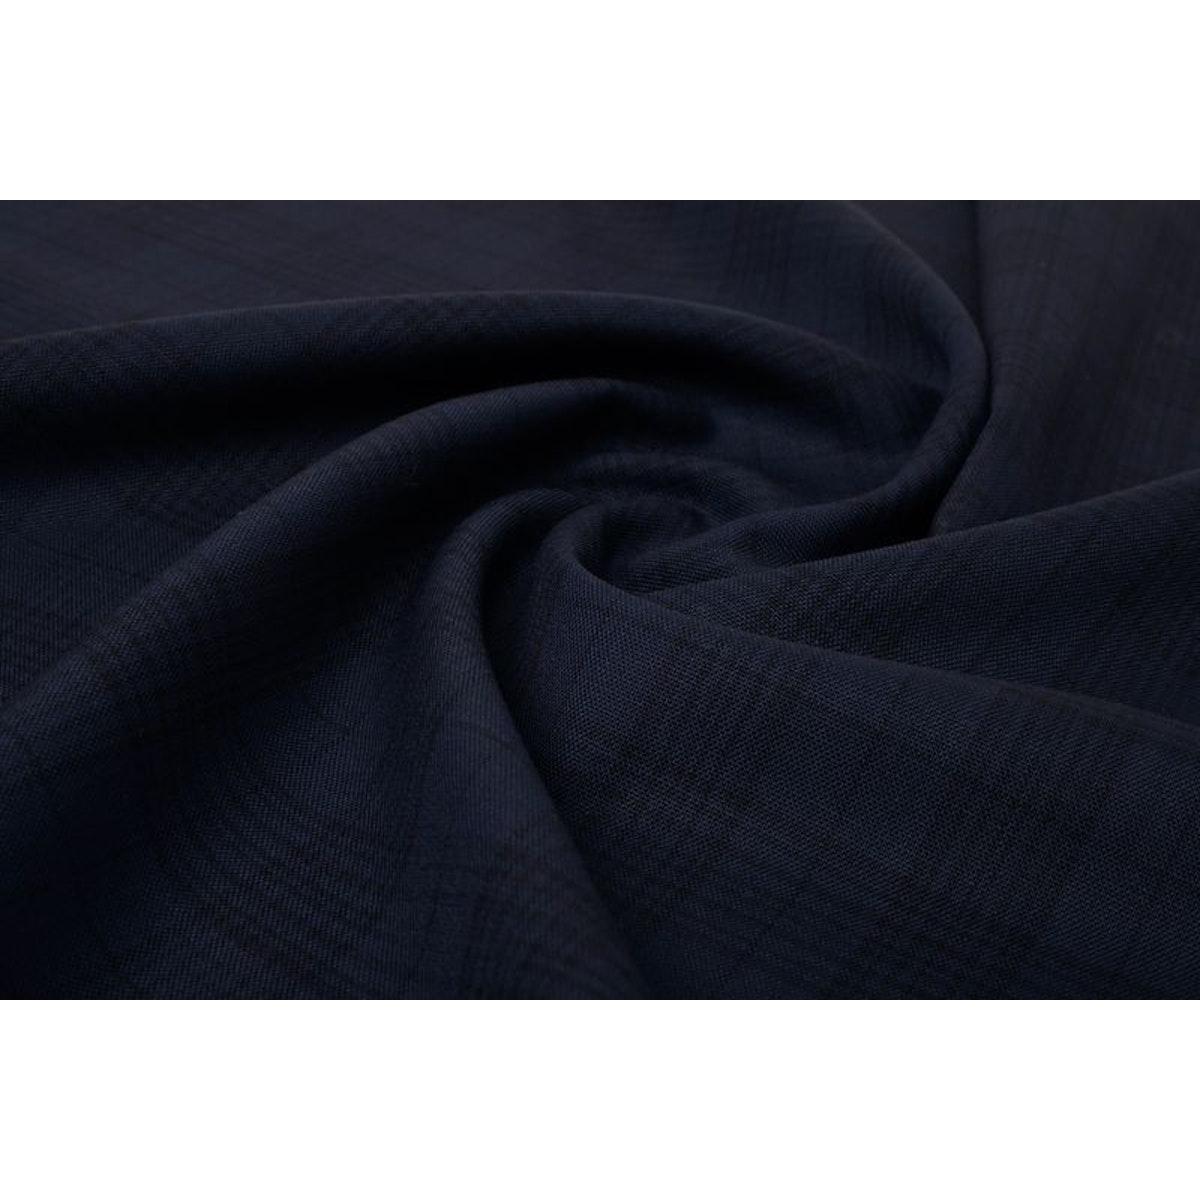 InStitchu Suit Fabric 110